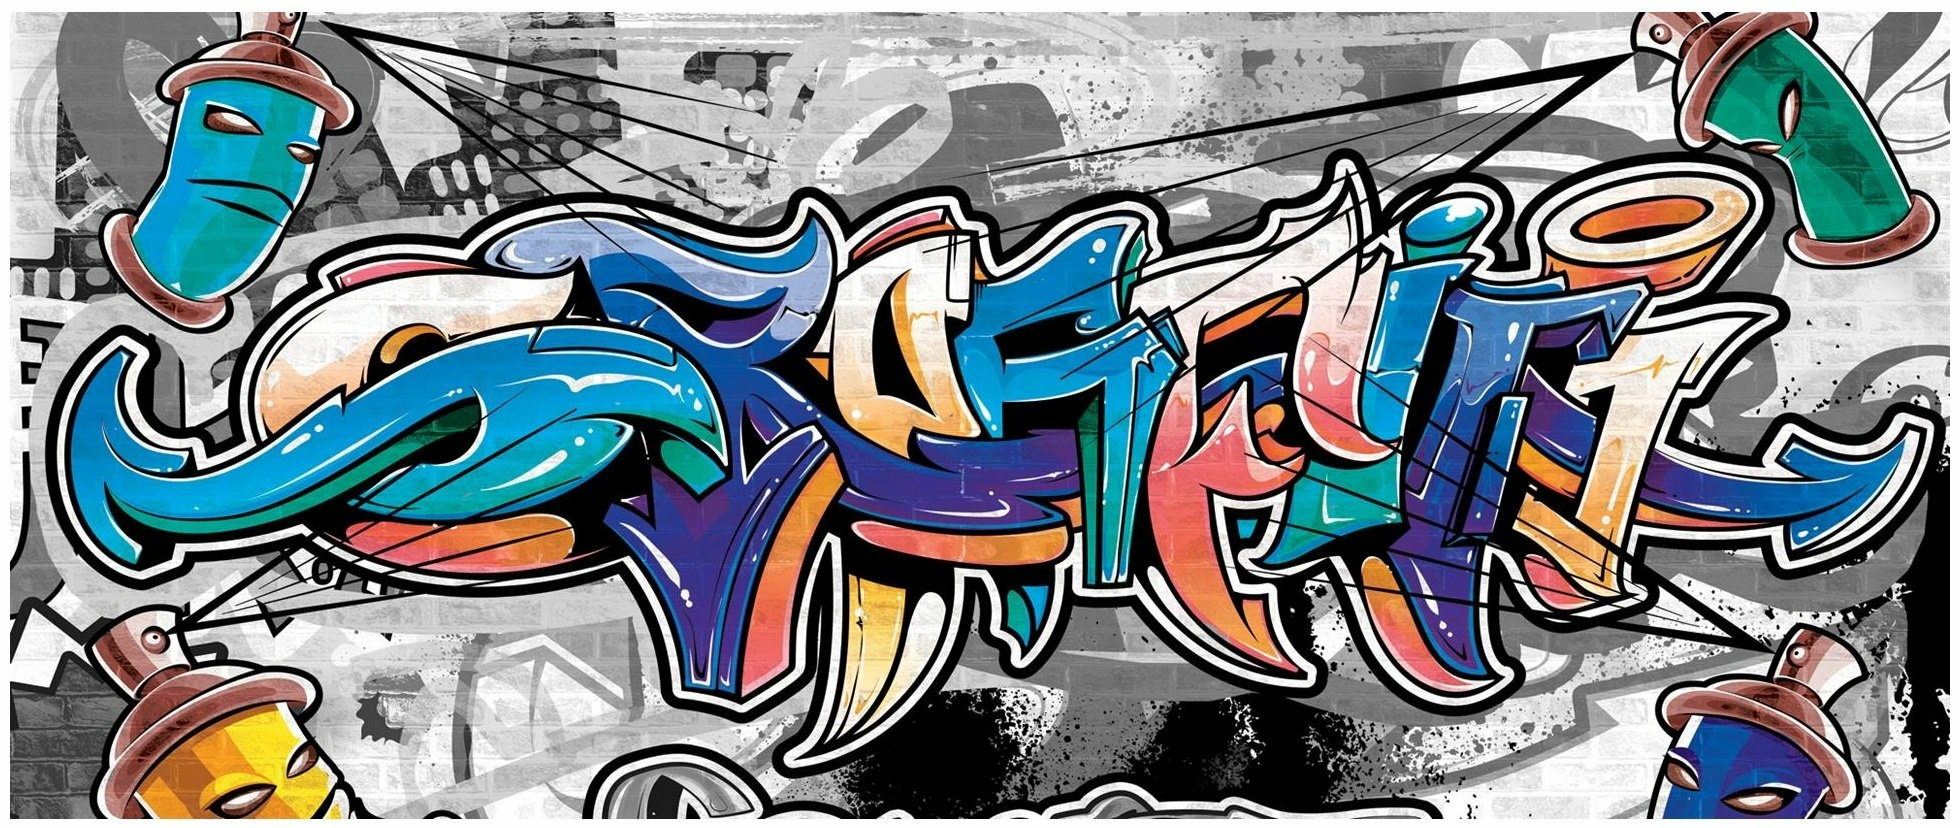 FOTOTAPETA GRAFFITI FOTOTAPETY NA ŚCIANĘ